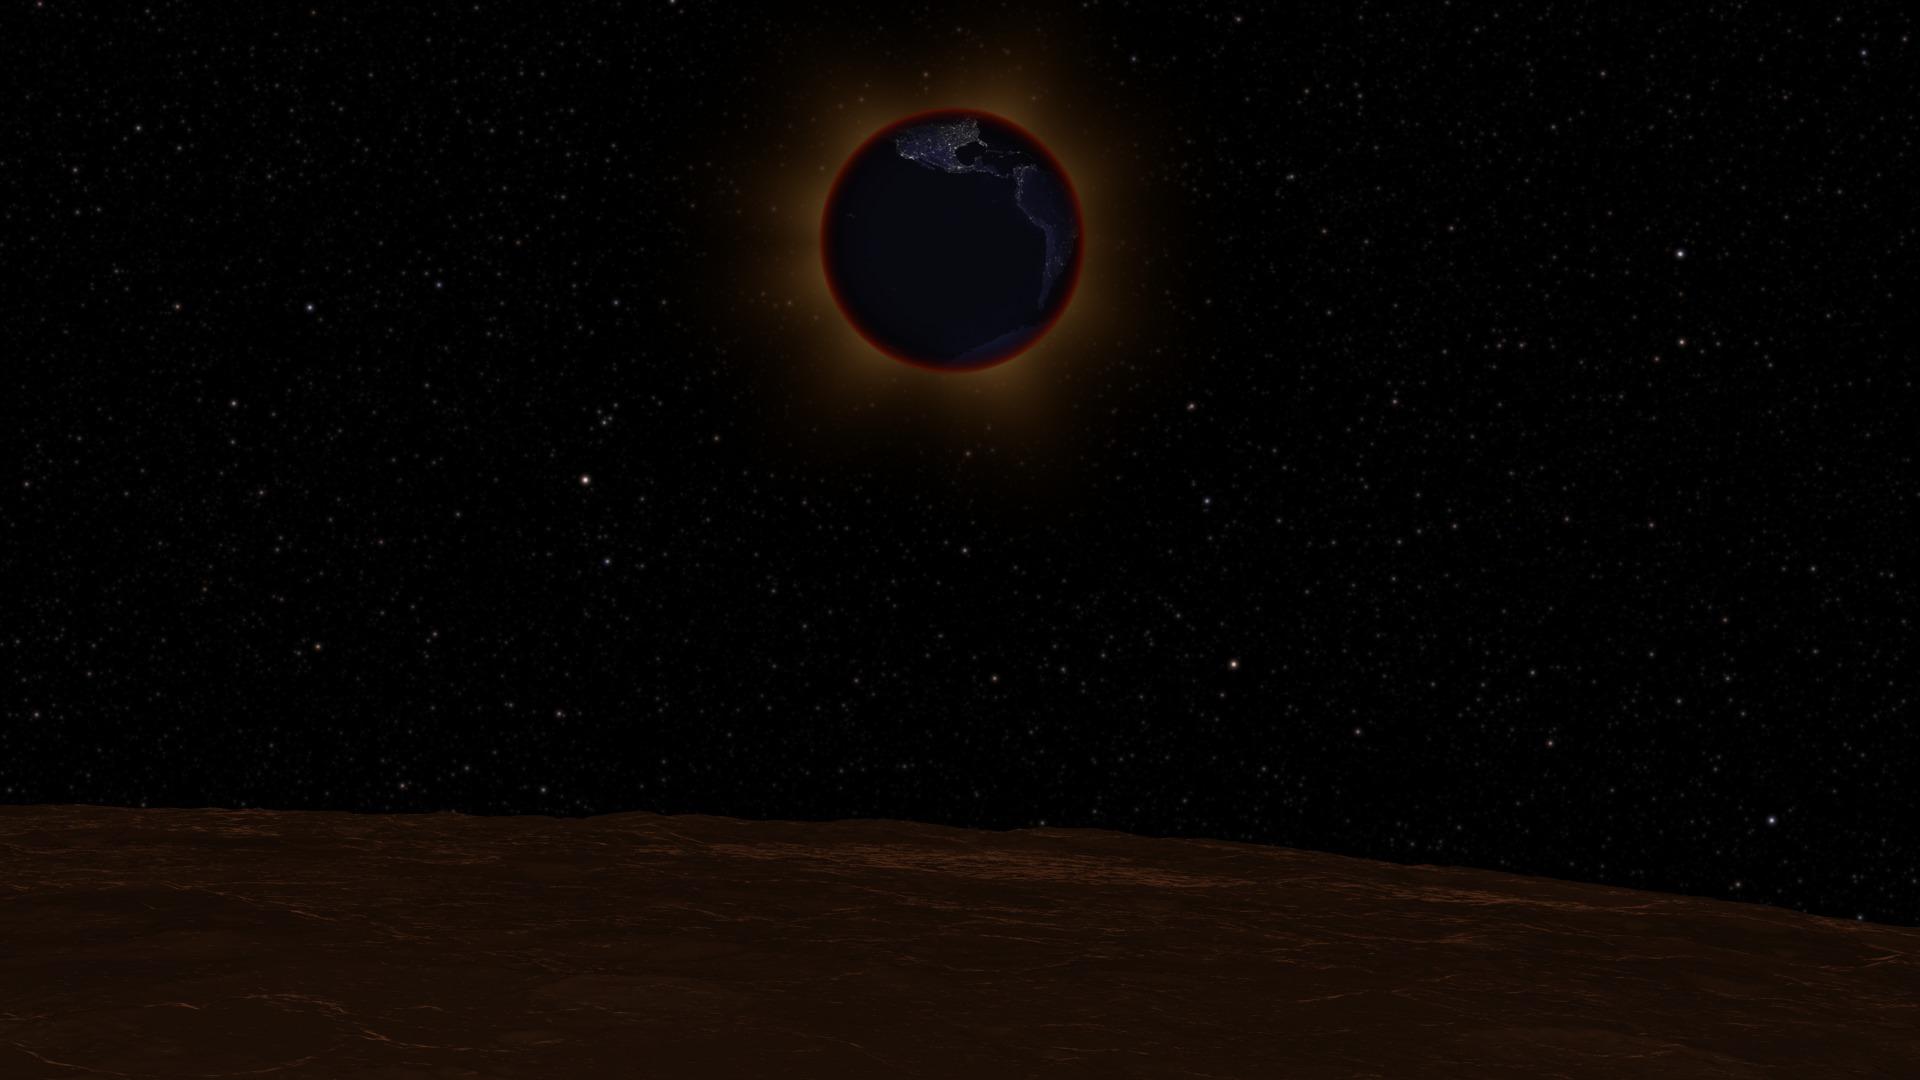 Lunar Eclipse of April 15, 2014 - Moon: NASA Science